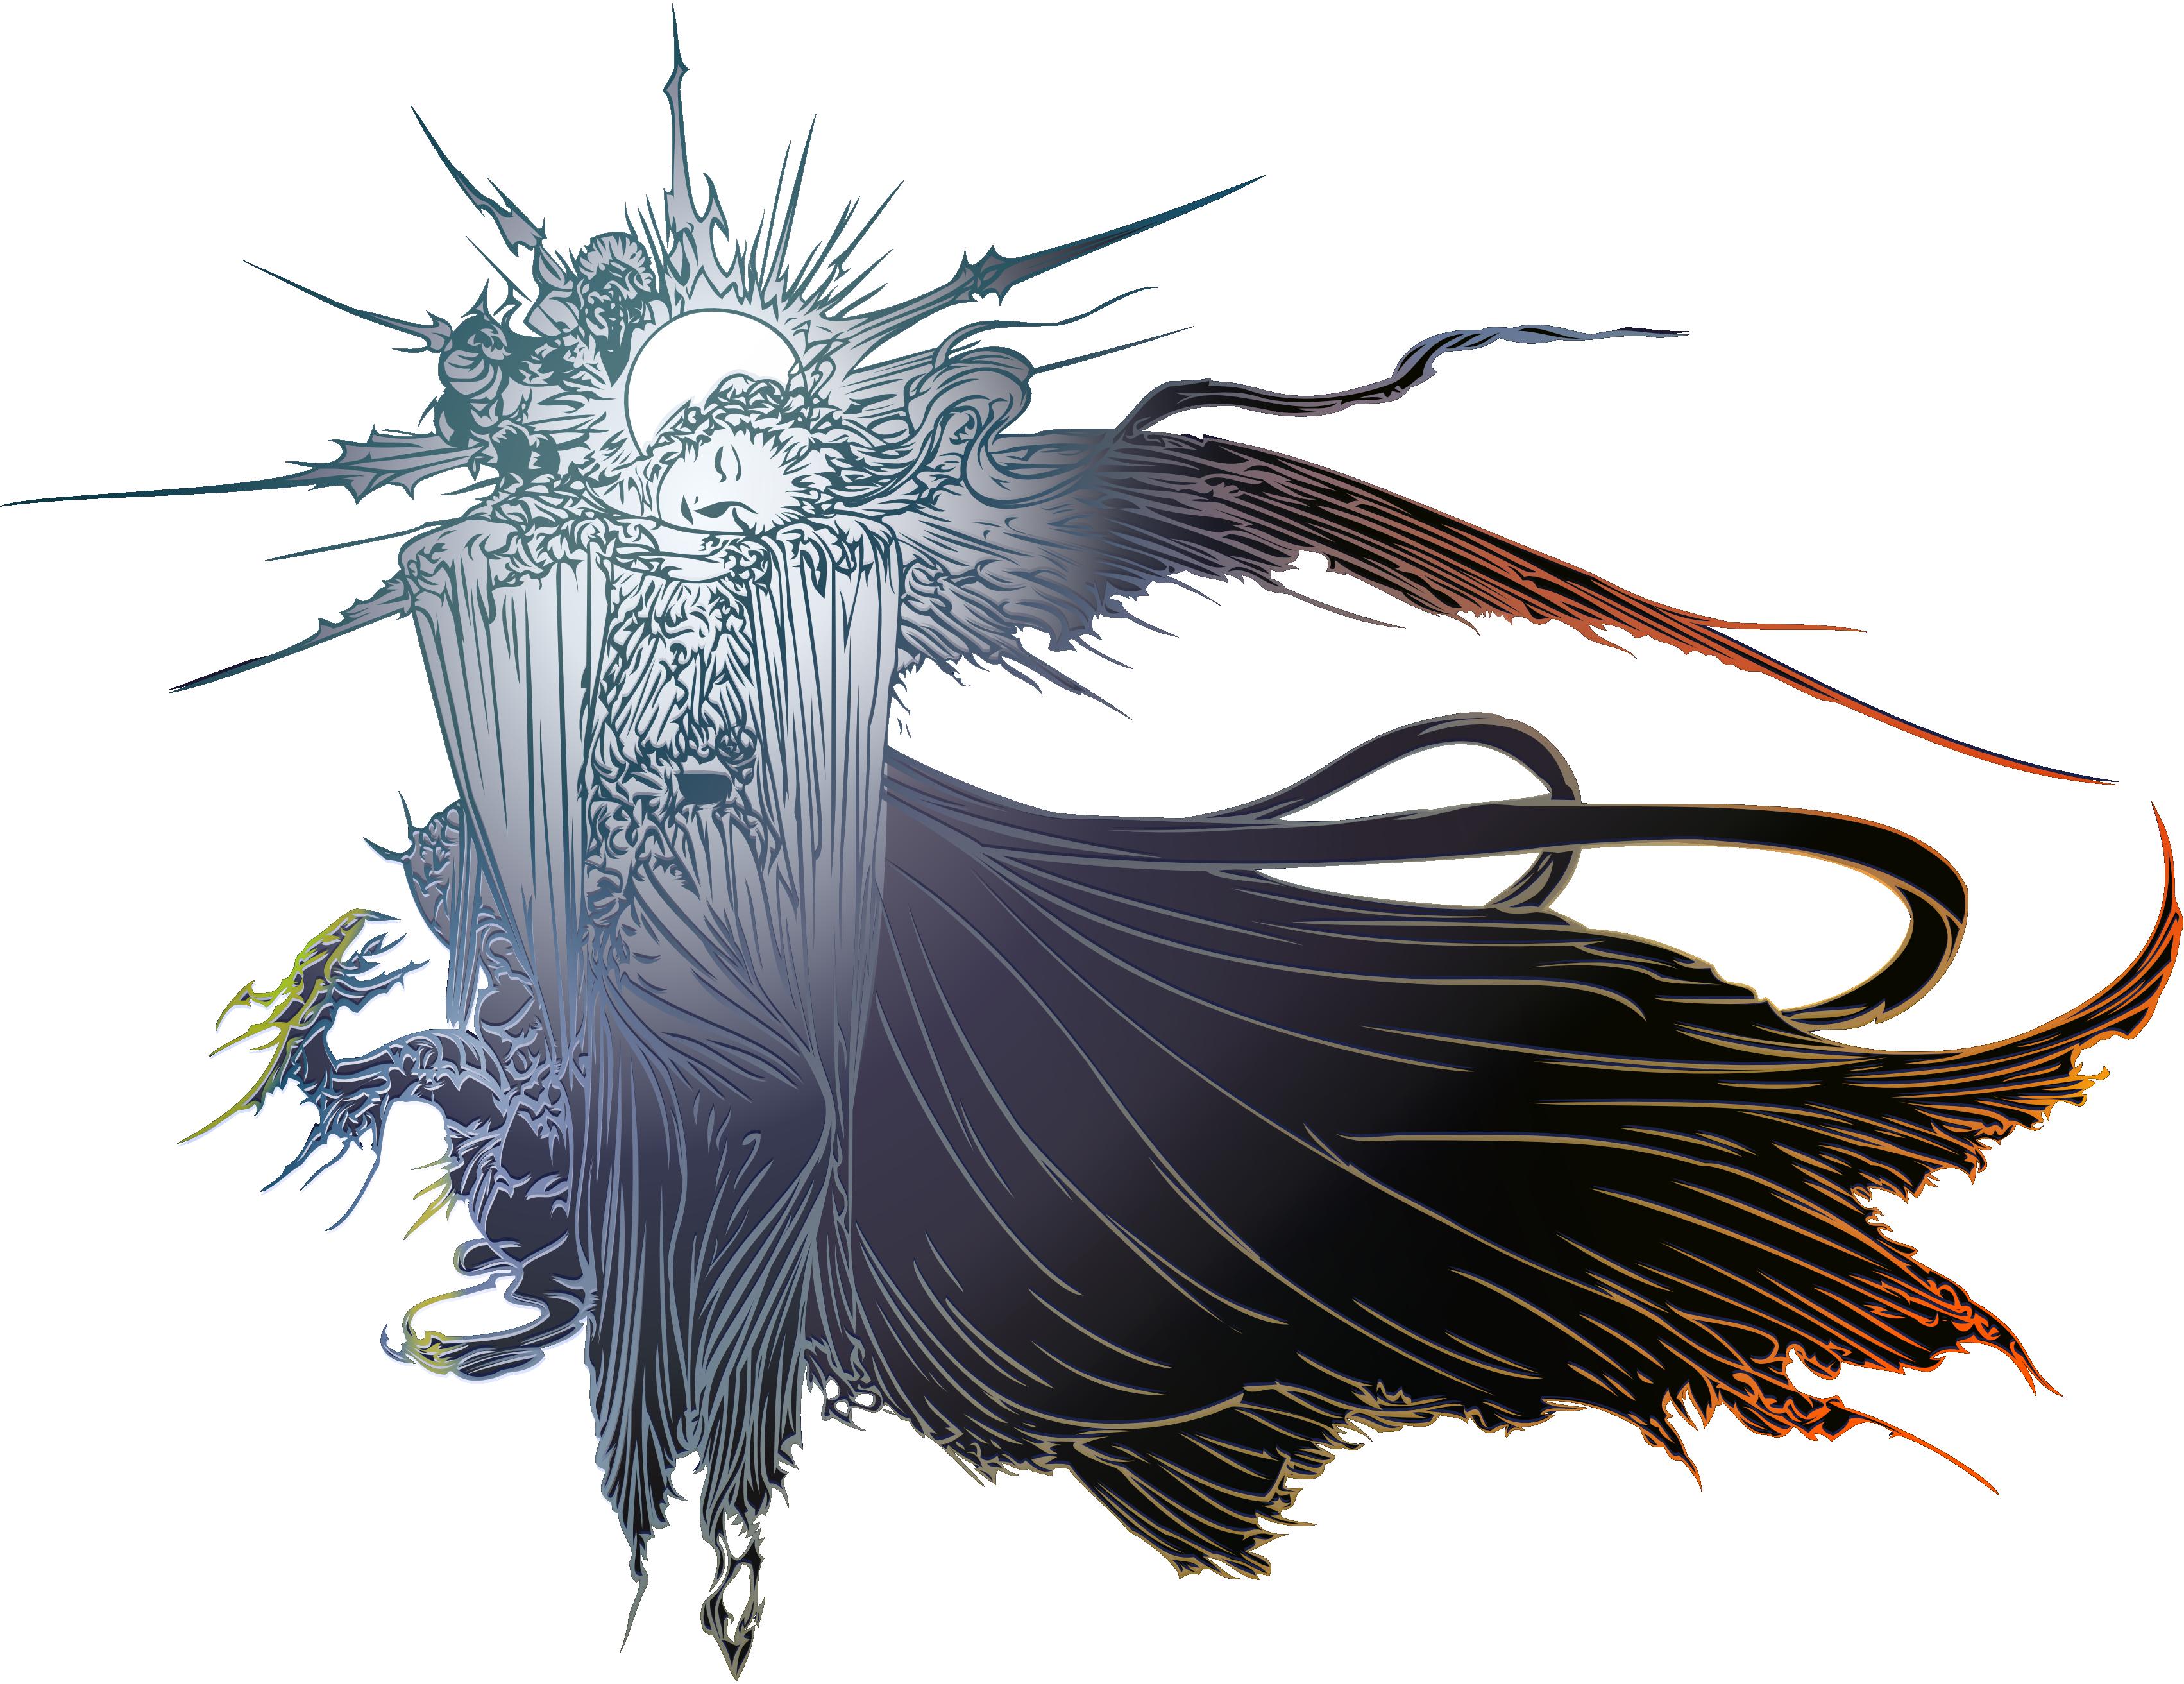 Final fantasy logo art - photo#32